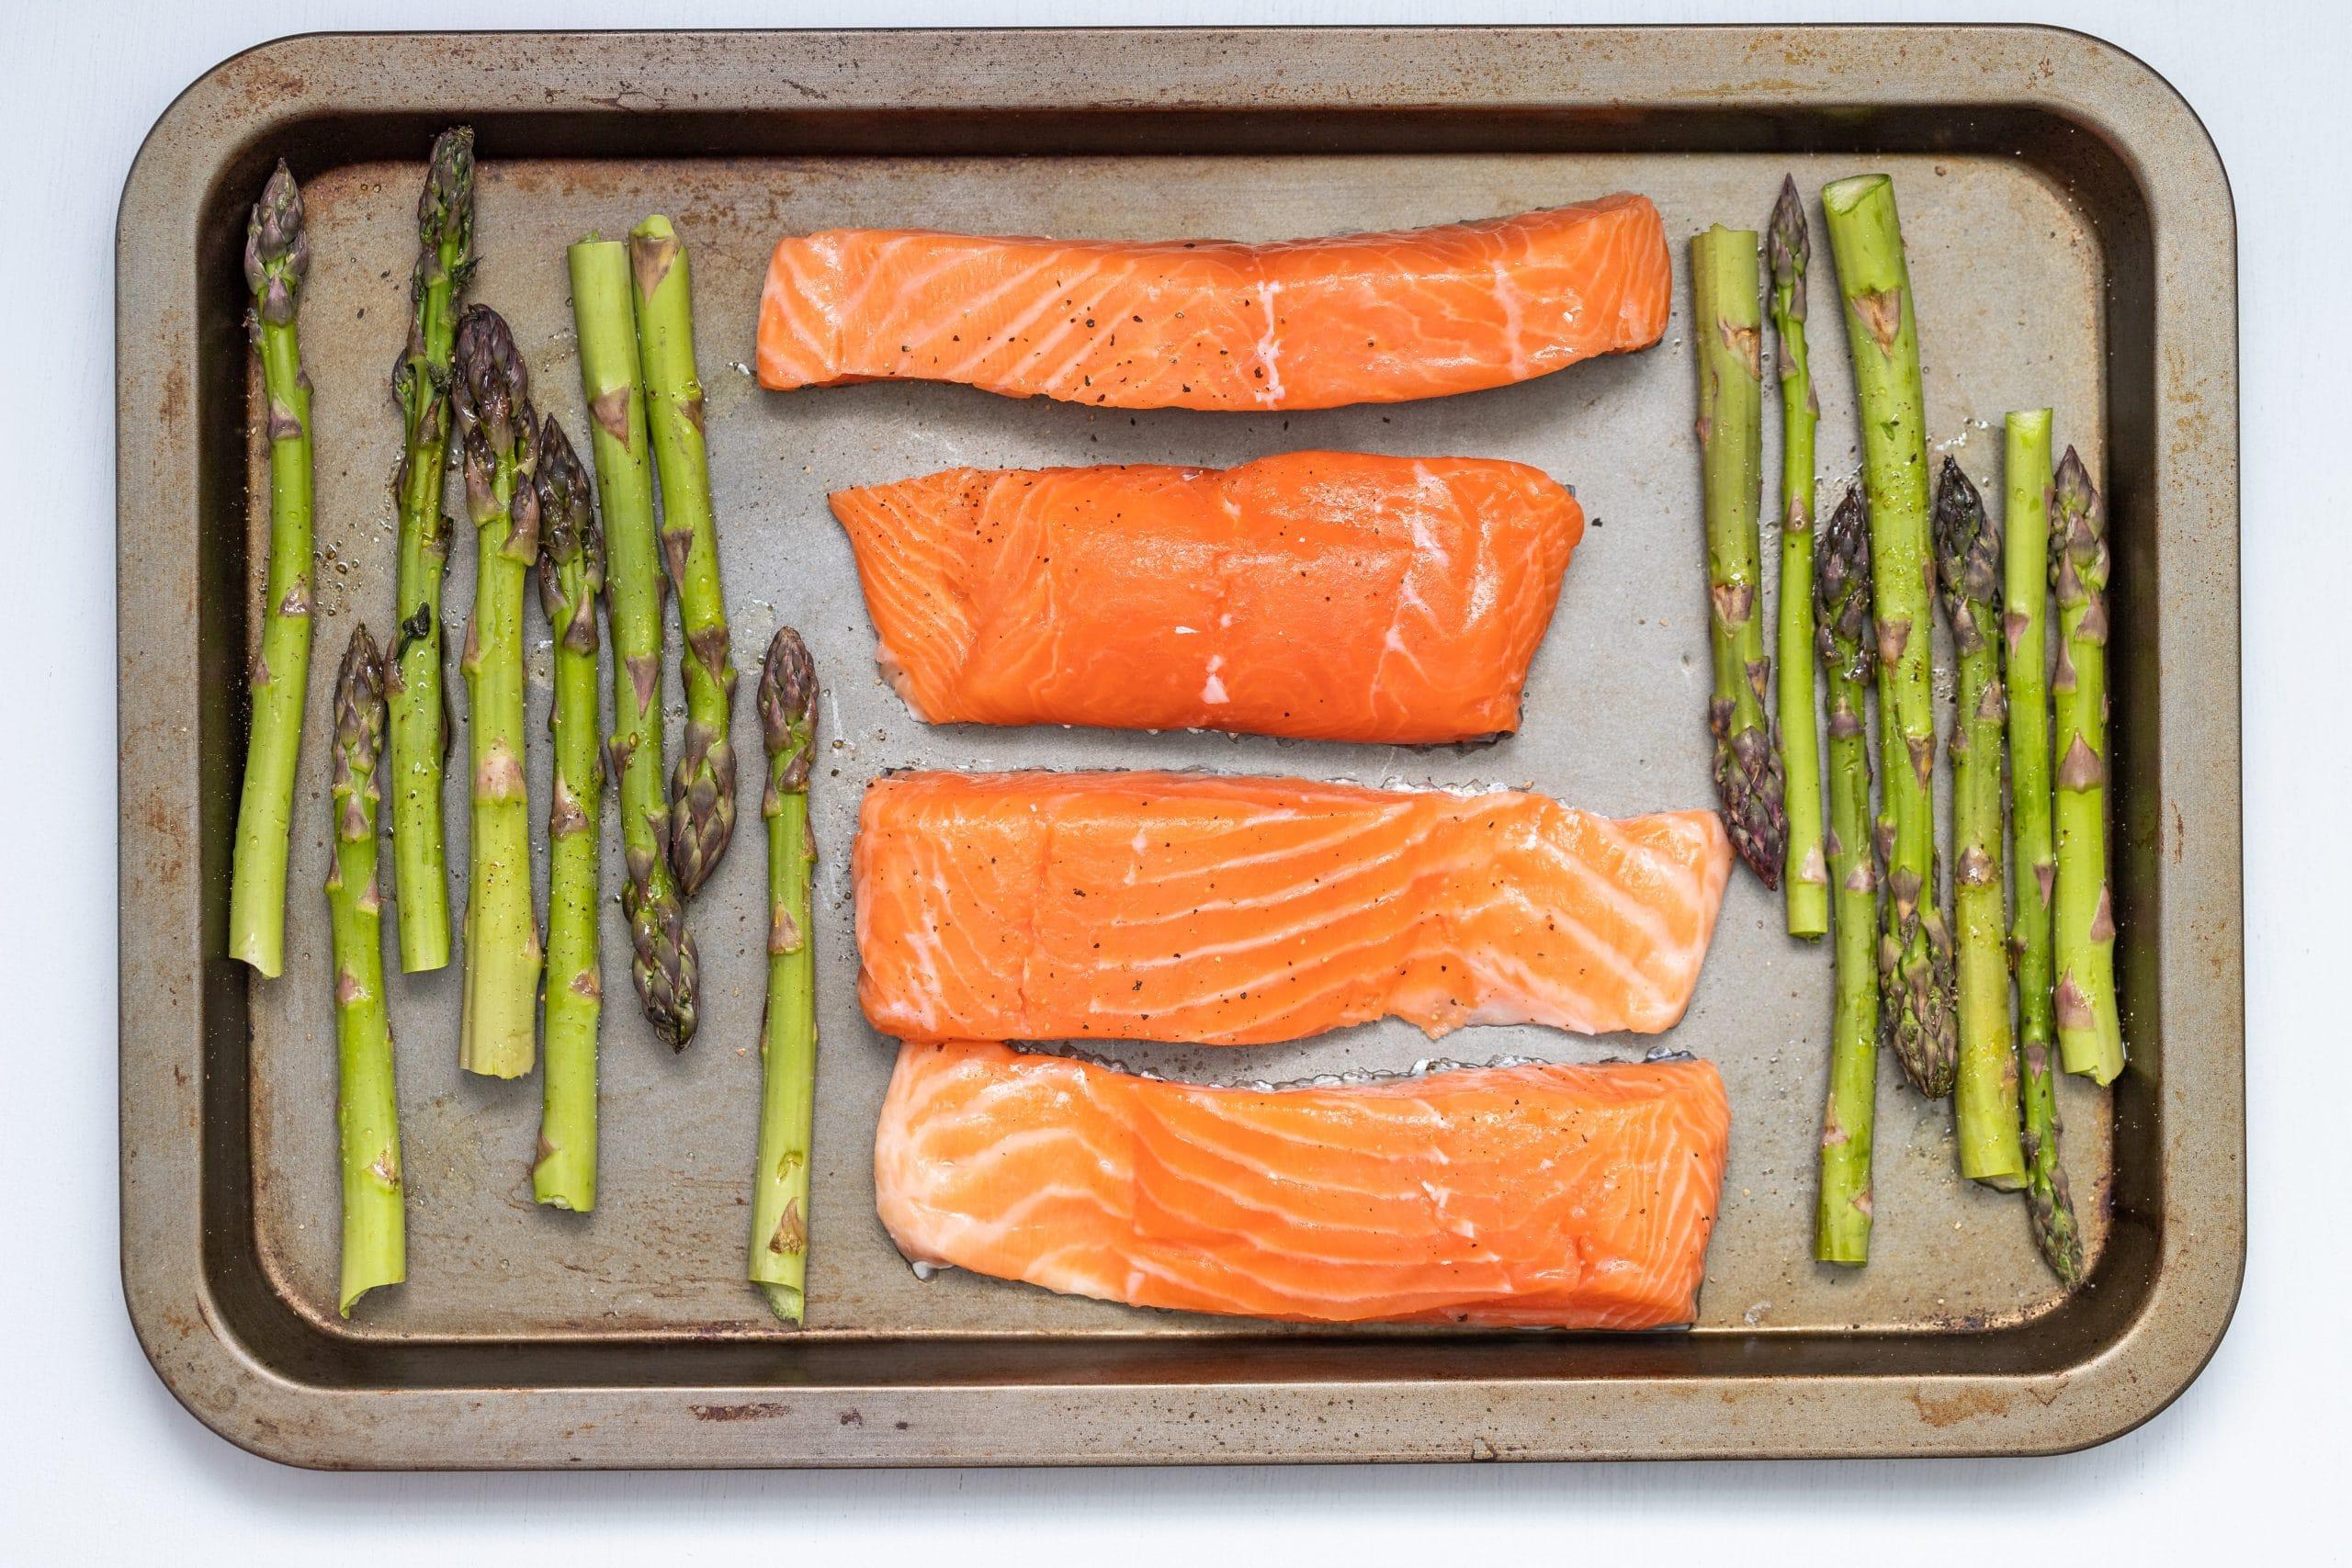 How long is asparagus good for